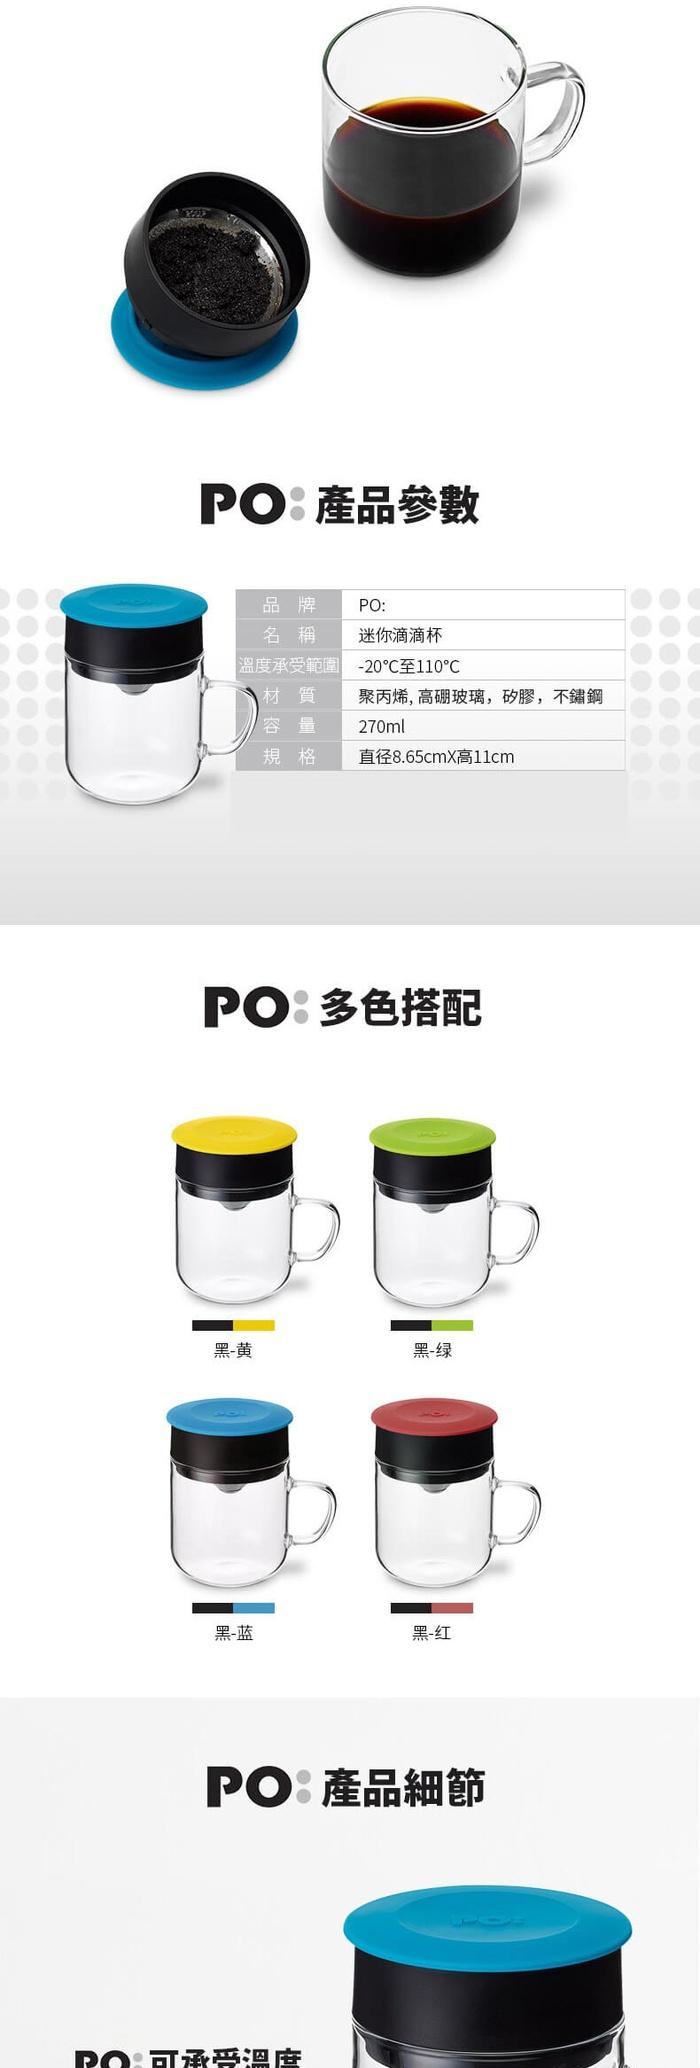 PO:Selected|丹麥研磨過濾咖啡玻璃杯240ml (綠)